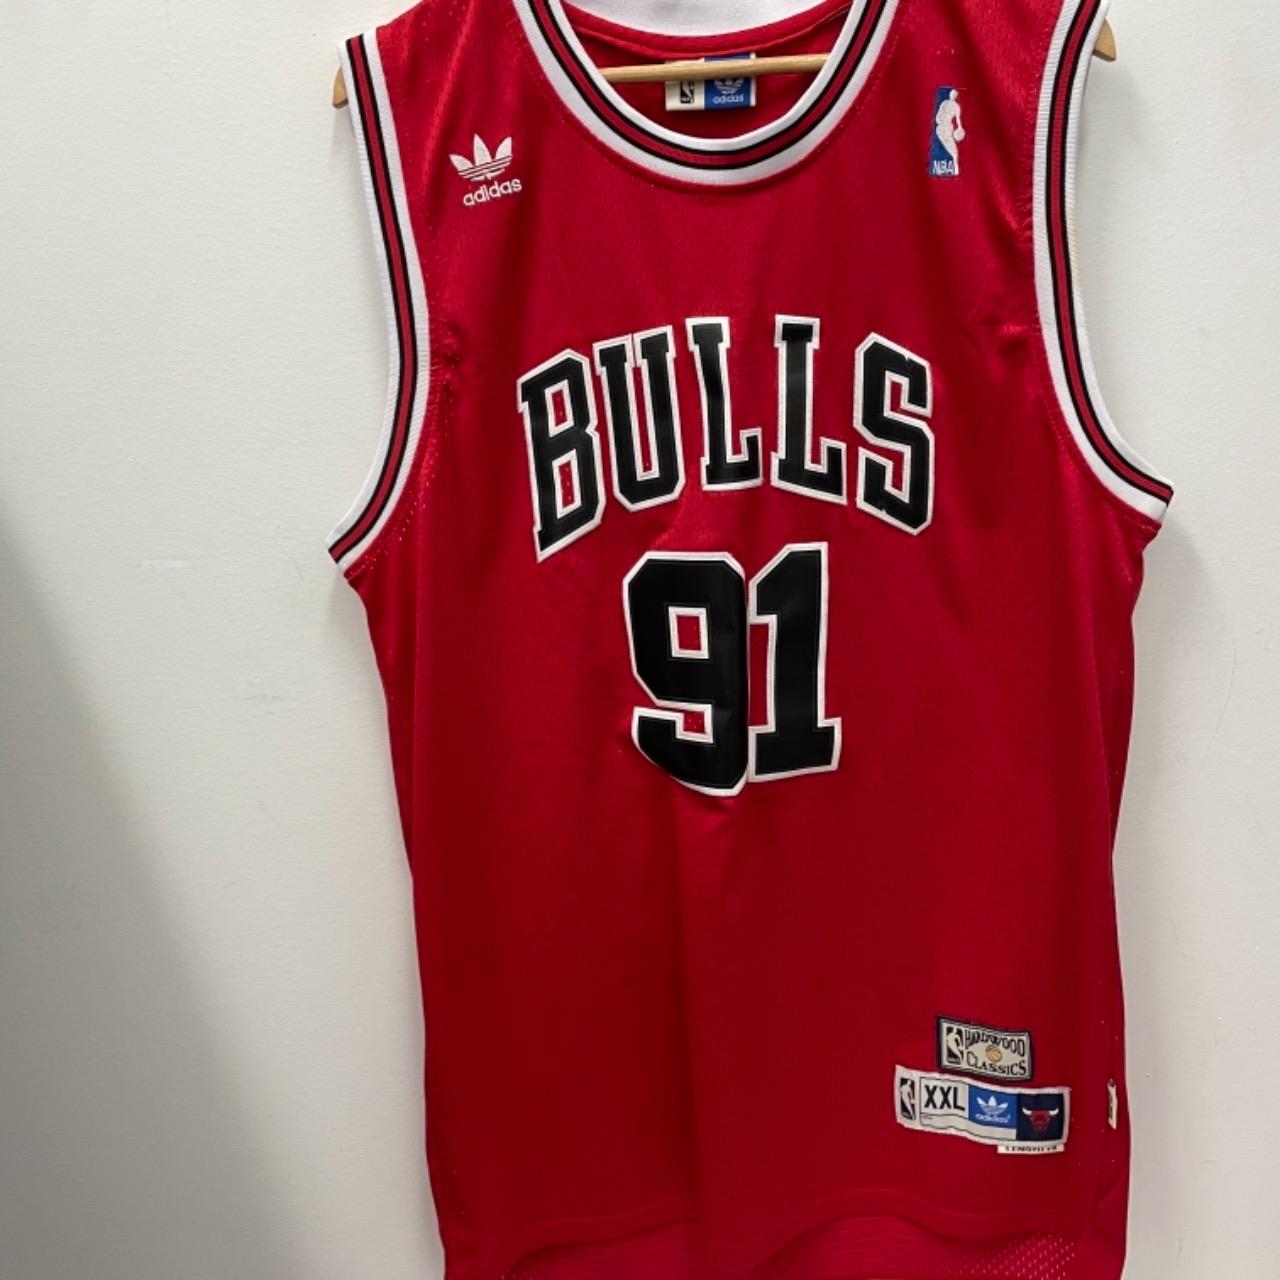 Adidas Mens Chicago Bulls Dennis Rodman #91 Jersey Size XXL Red